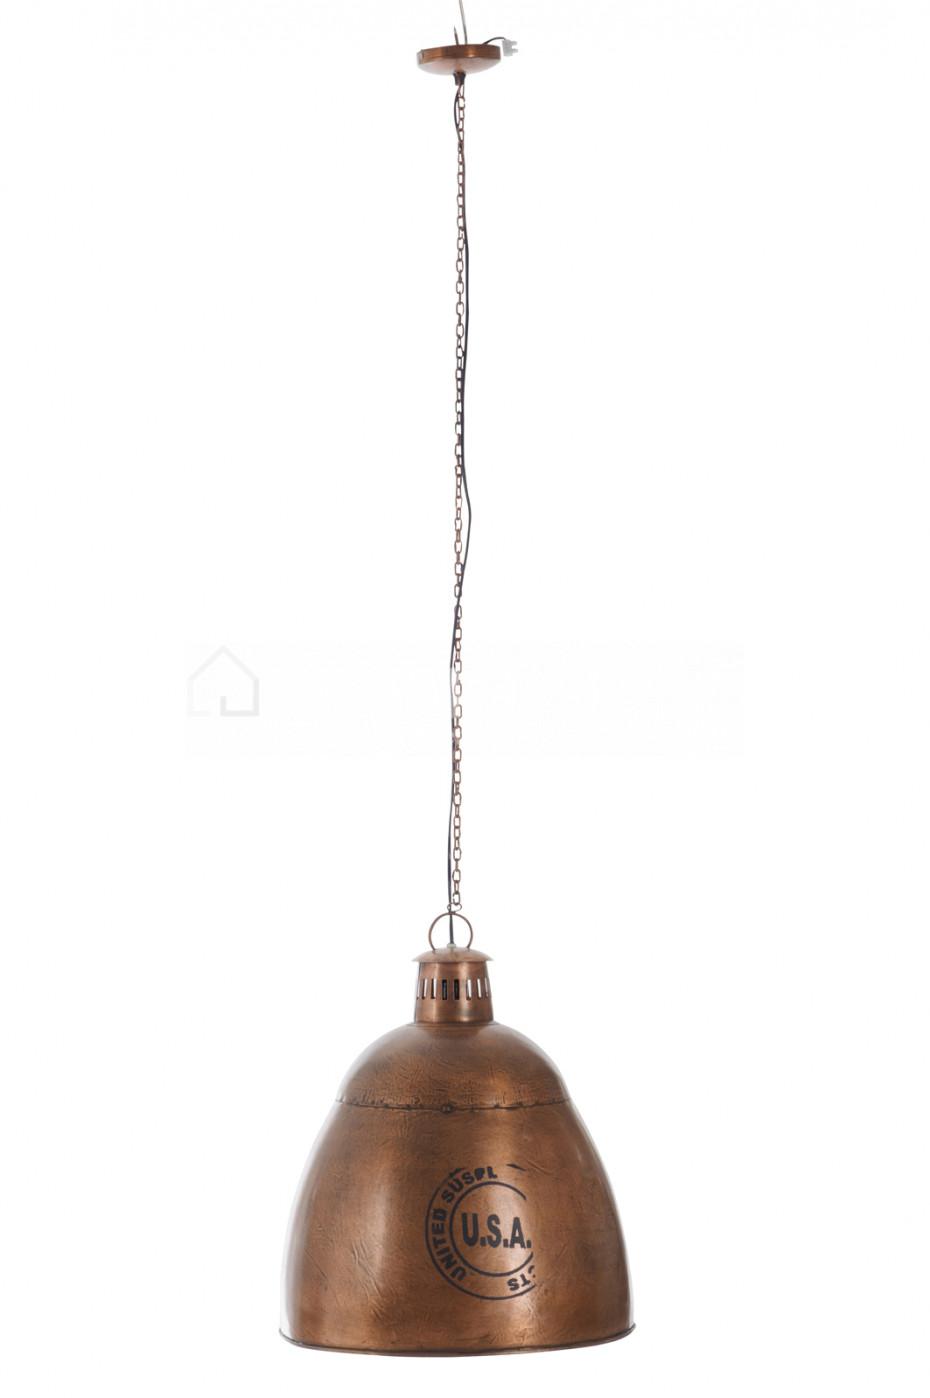 usa-hanglamp-metaal-cottage-verlichting